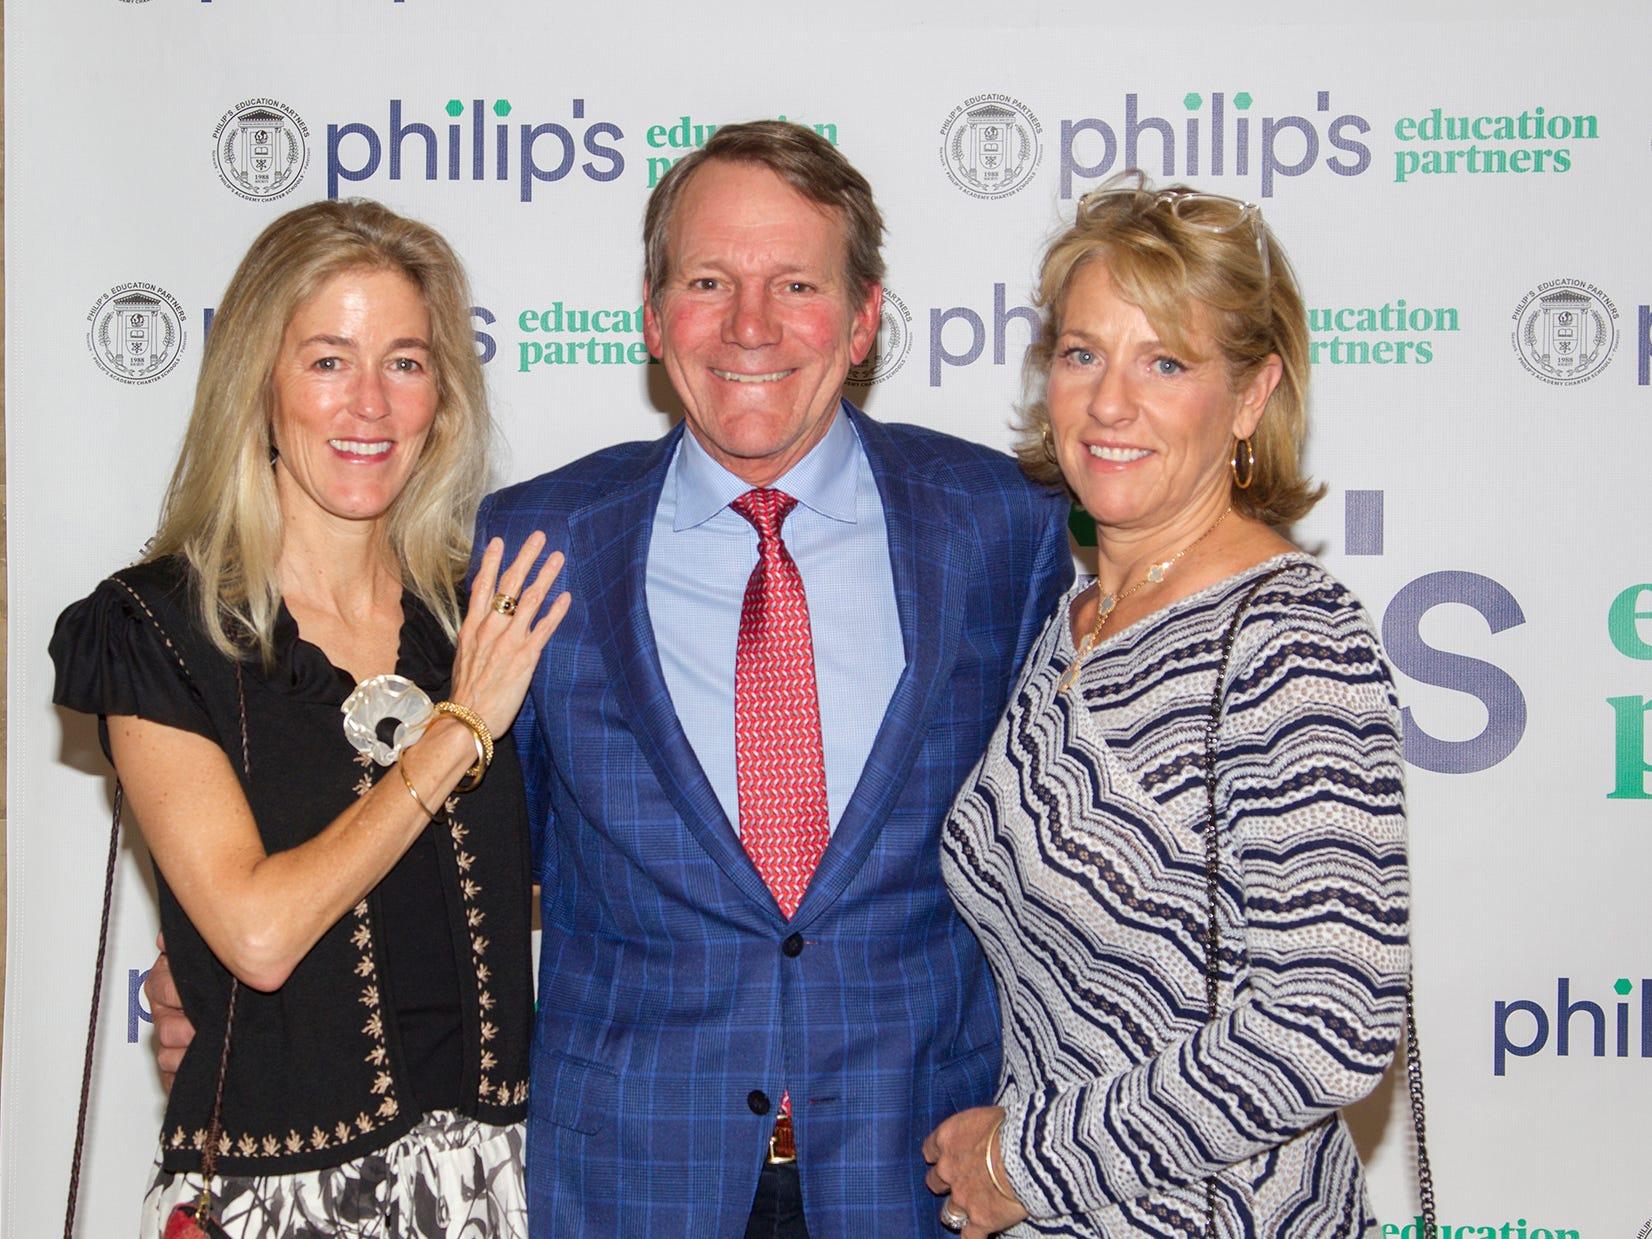 Betsy Walton, Scott and Tracey Biedron. Philip's Education Partners host The Dream Maker 30th anniversary gala at The Mezzanine in Newark 3/29/2019.